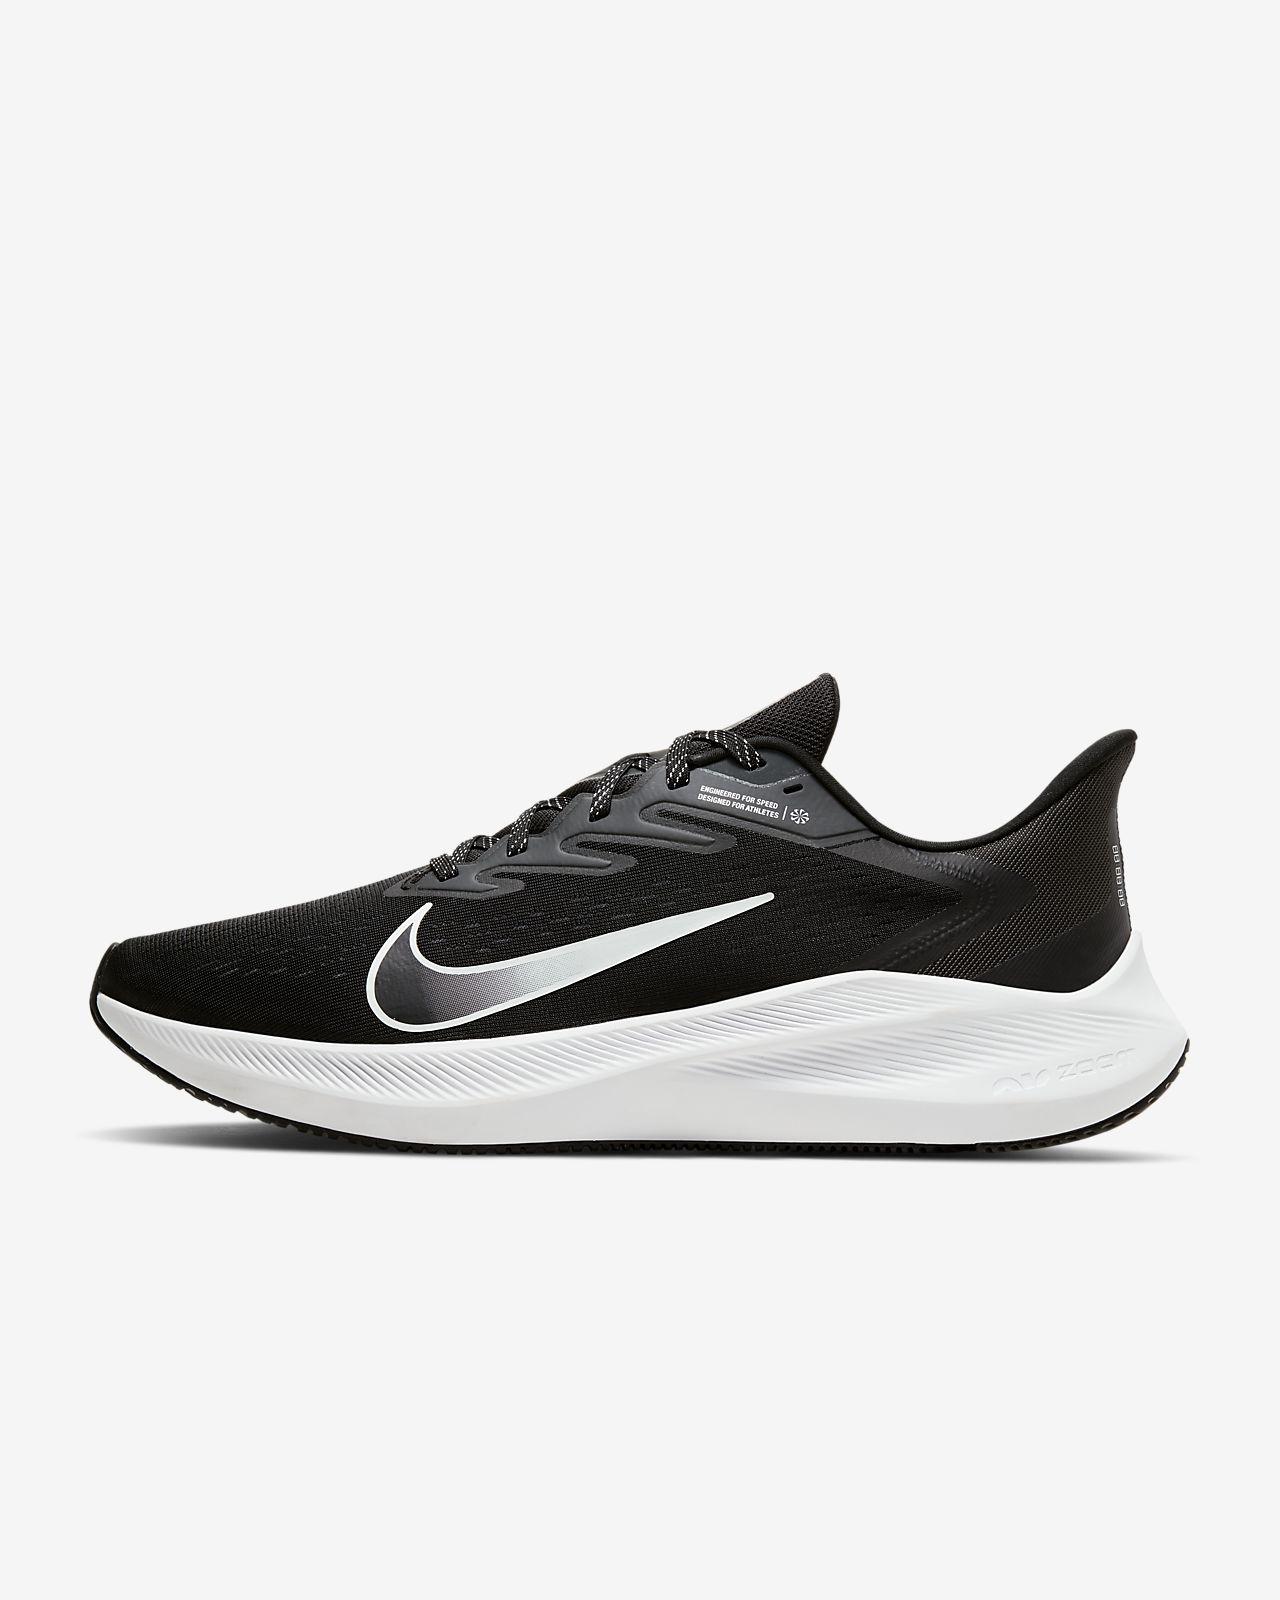 Nike Zoom Winflo 7 男子跑步鞋